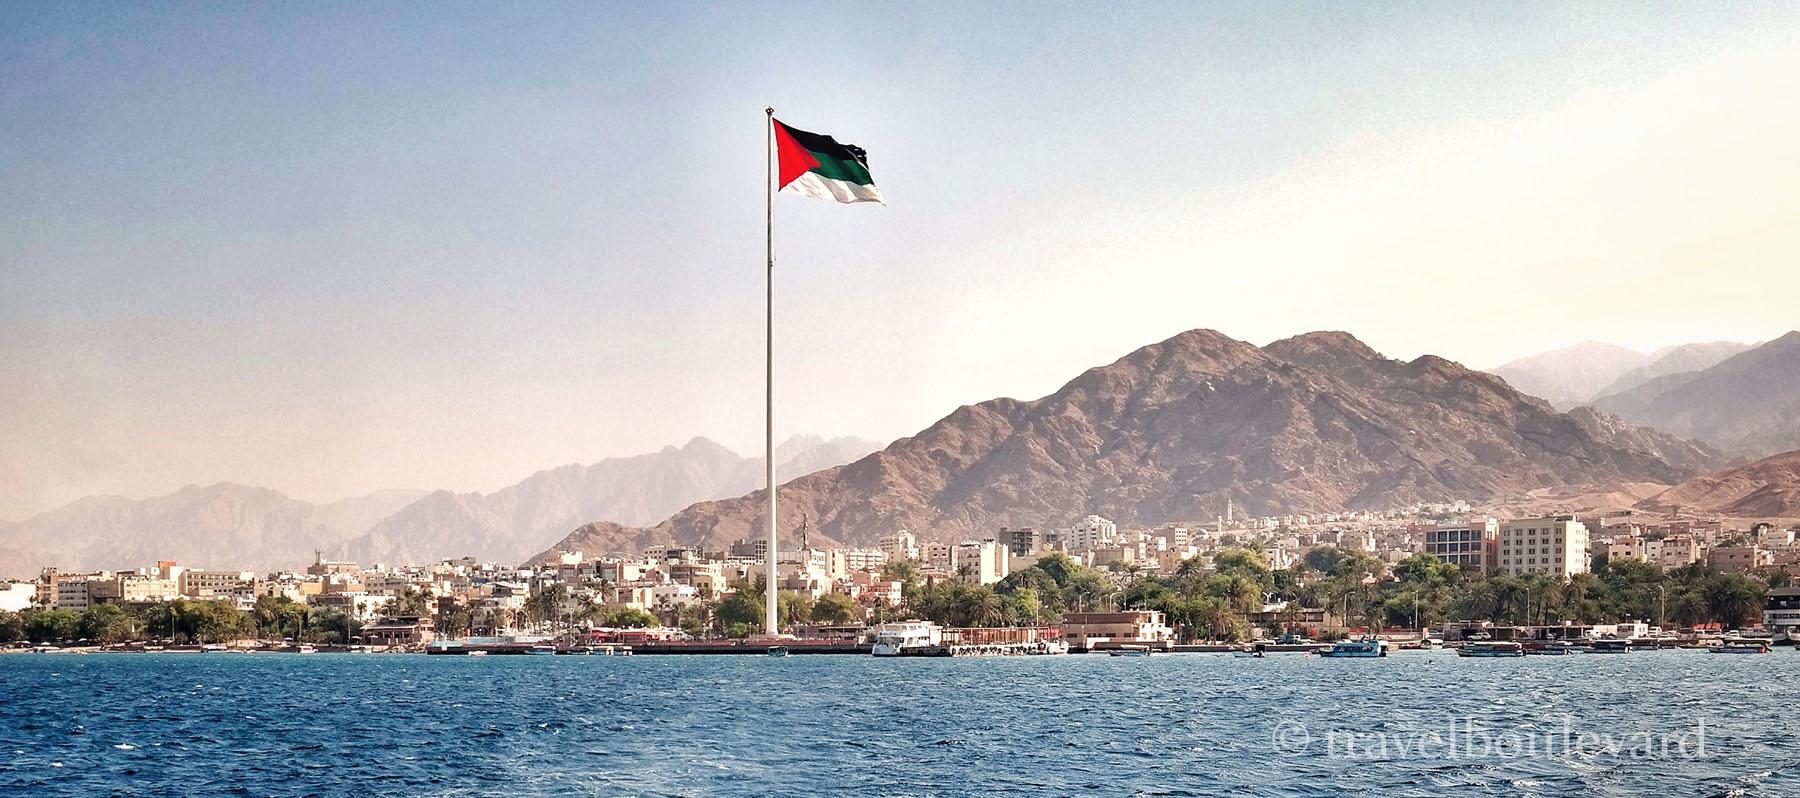 aqaba jordanie vlaggenmast